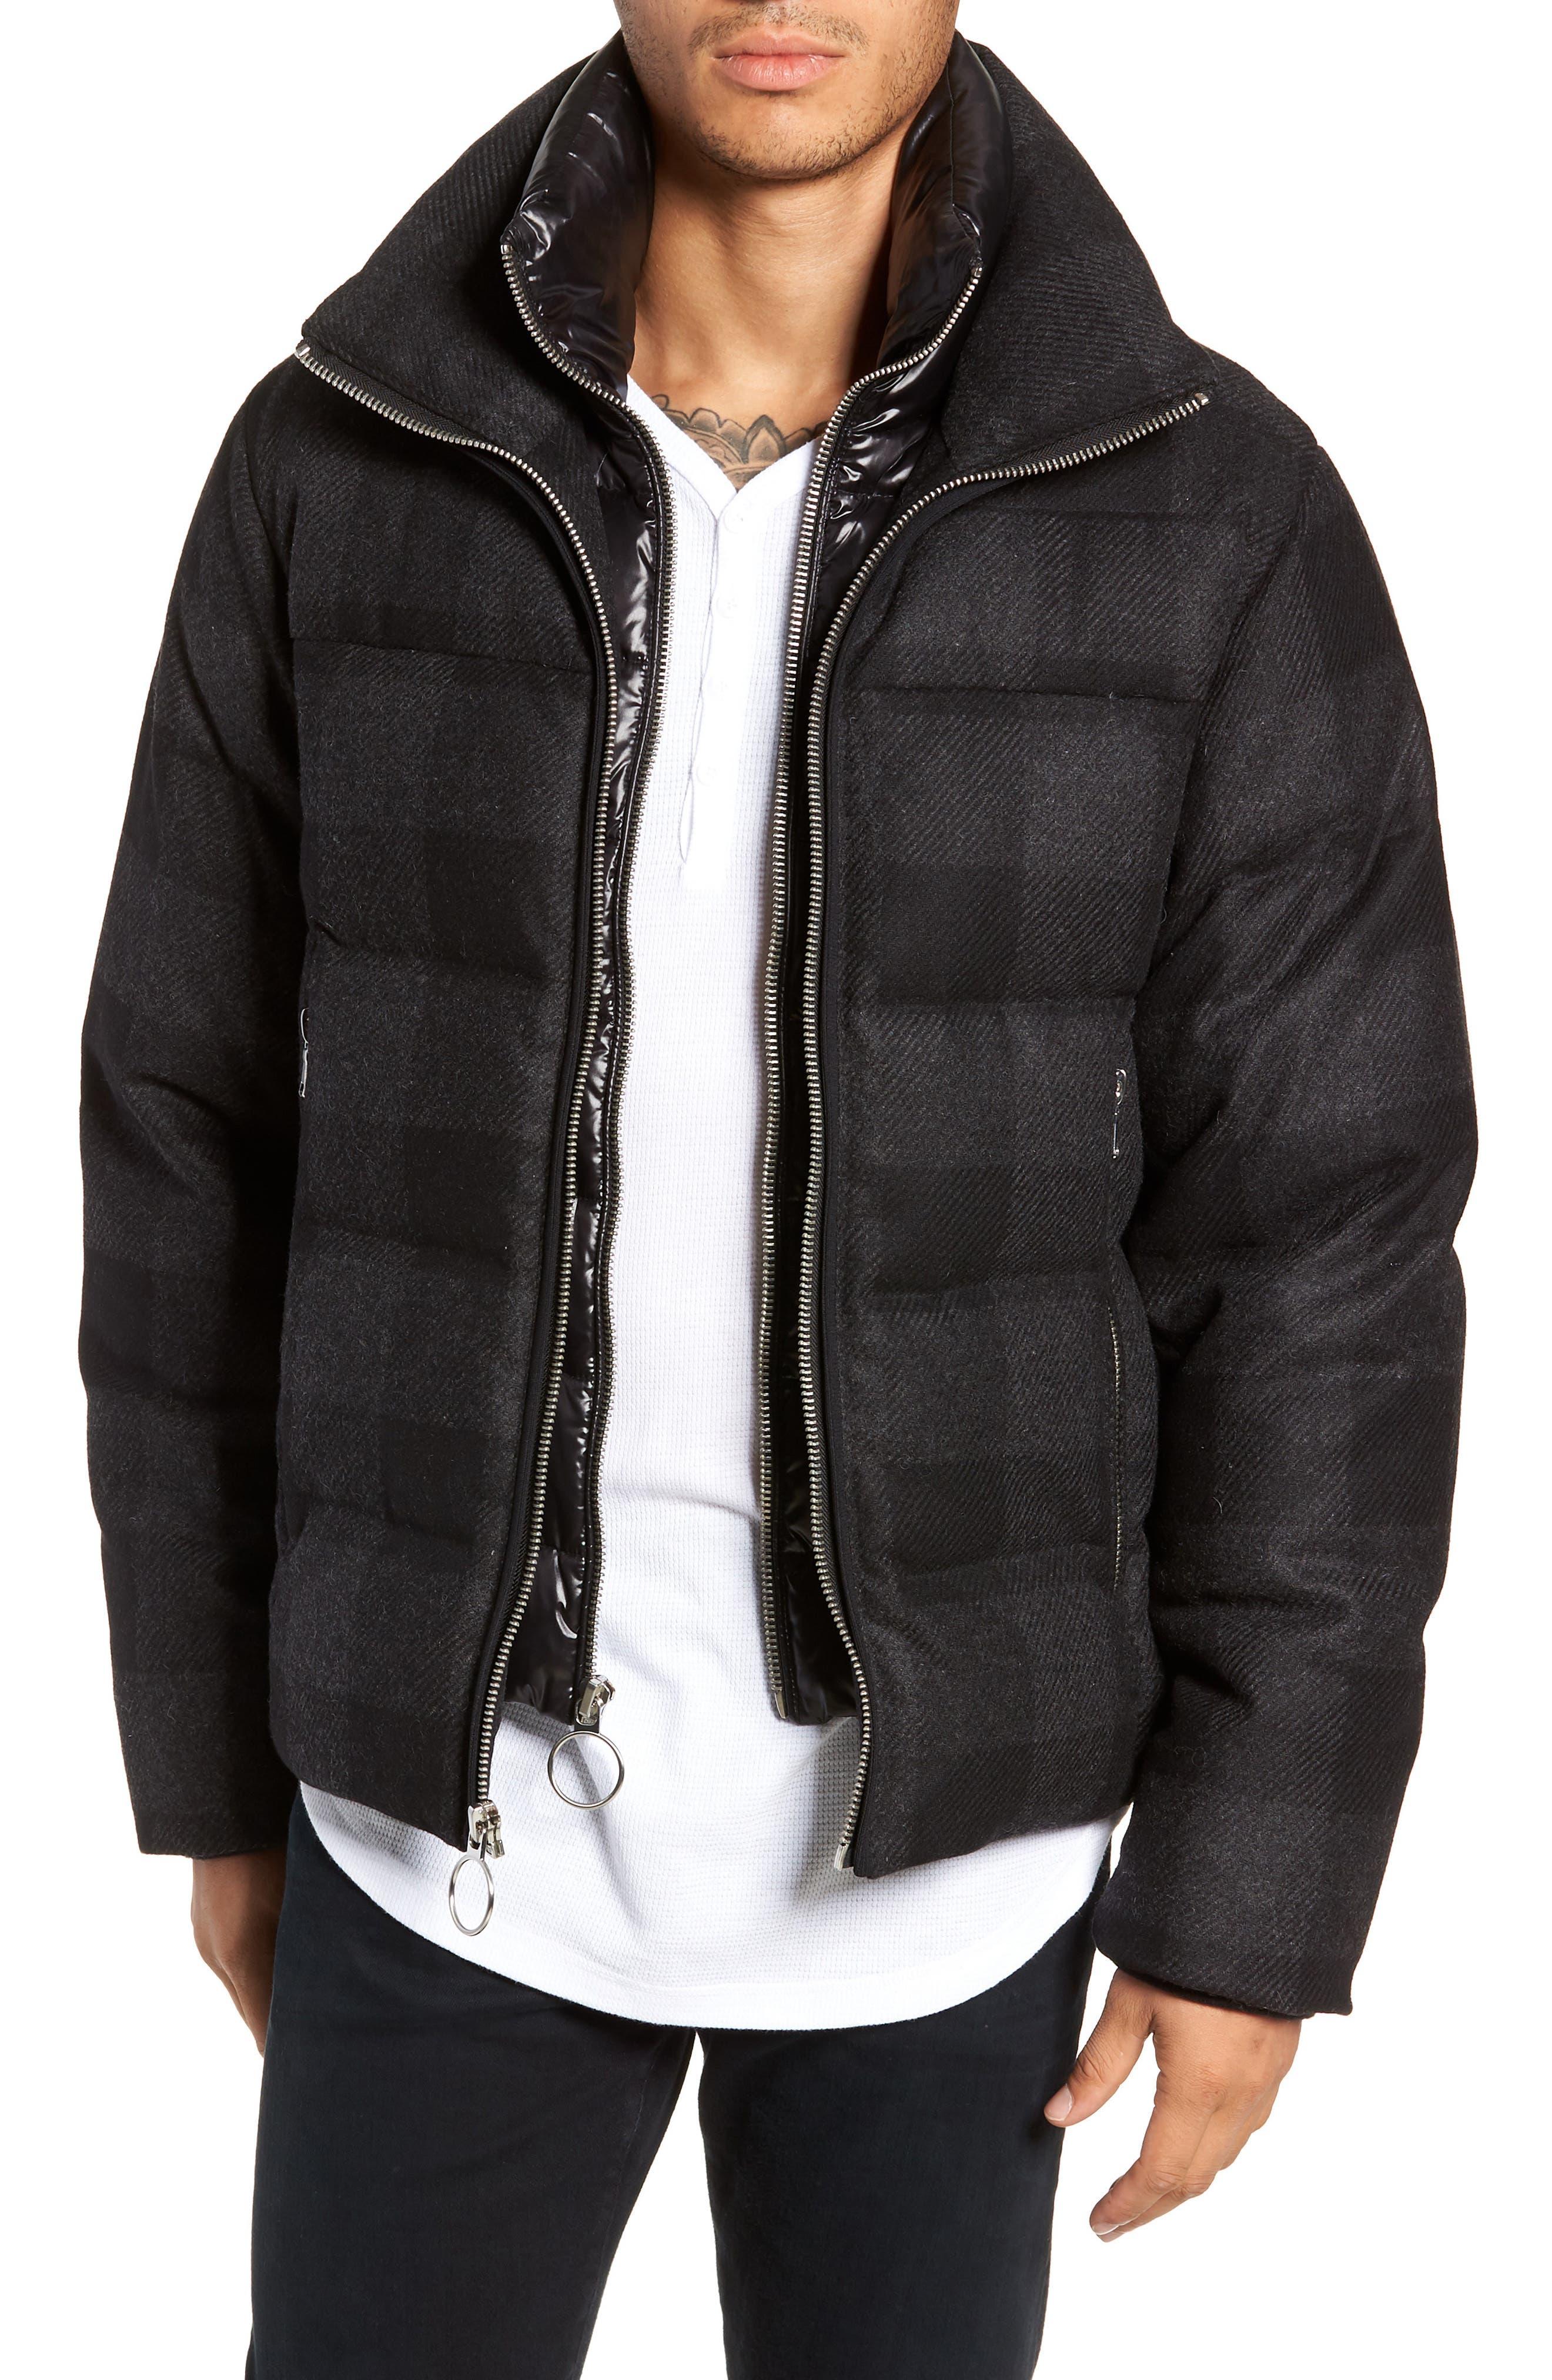 Crosby Plaid Wool Bib Puffer Jacket,                             Main thumbnail 1, color,                             CHARCOAL/ BLACK PLAID